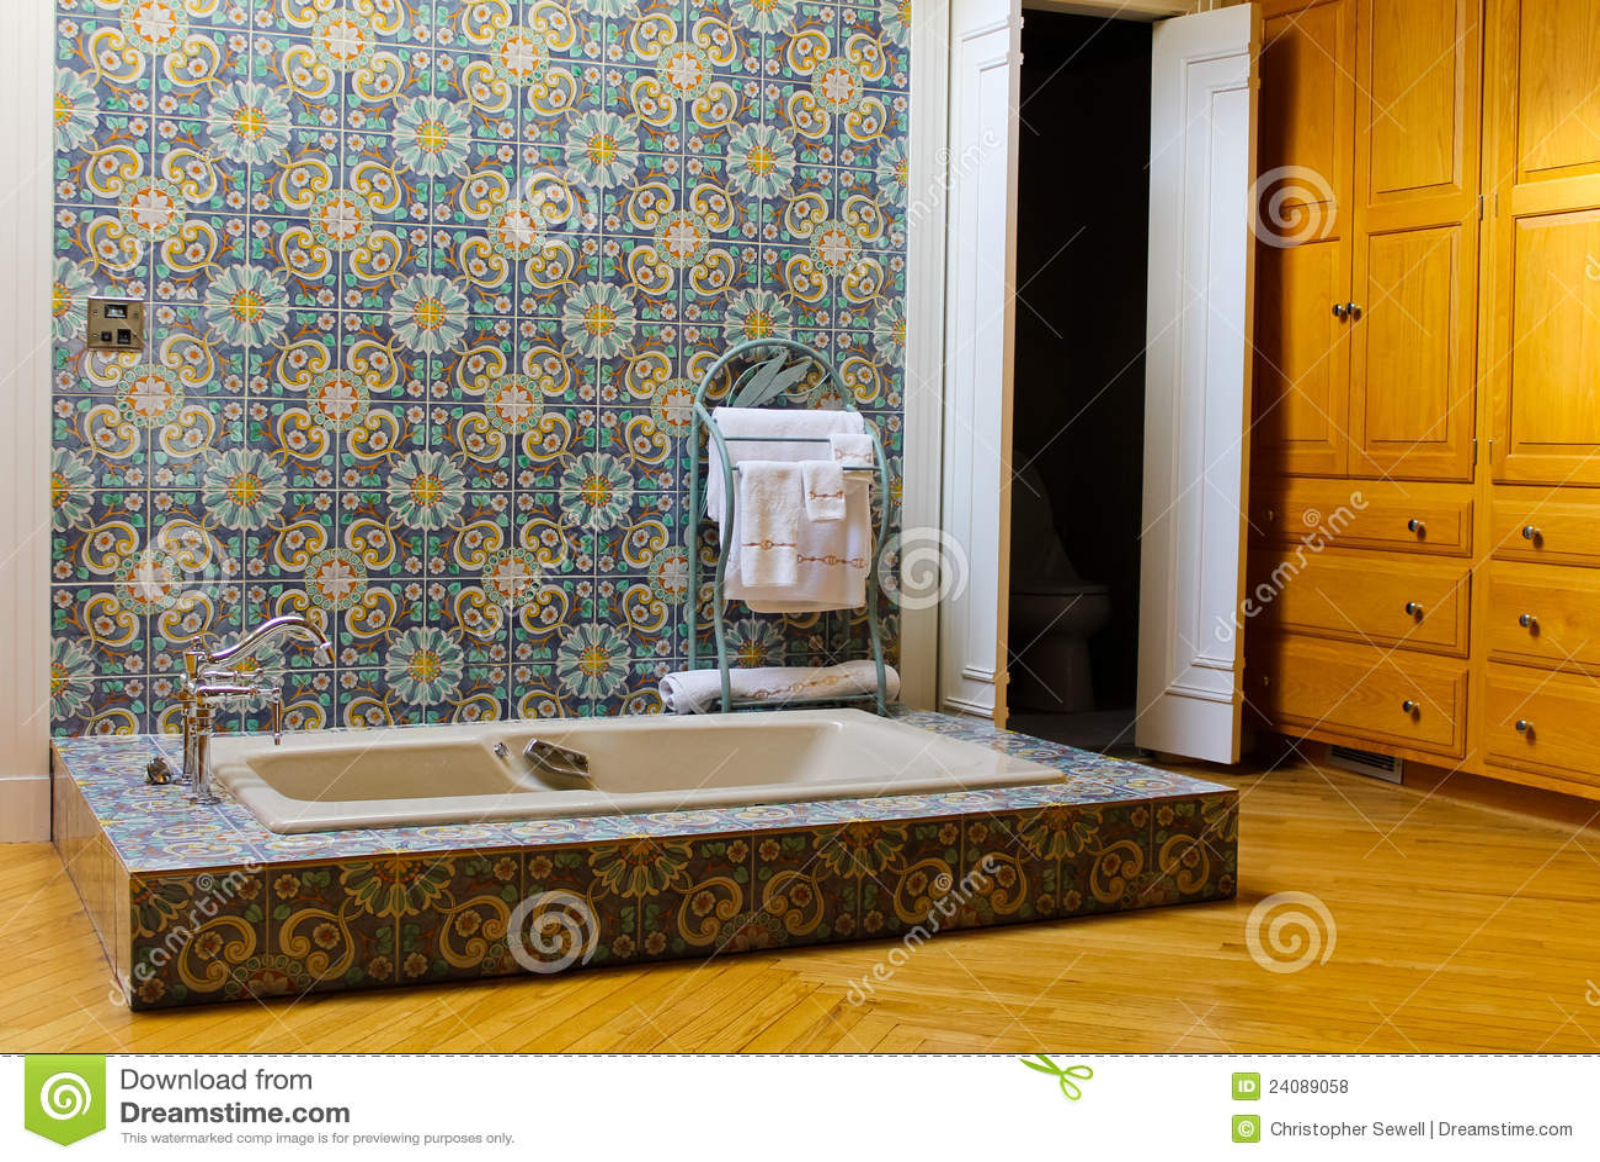 Rustikale badezimmer szene lizenzfreie stockfotos bild 24089058 - Rustikale badezimmer ...